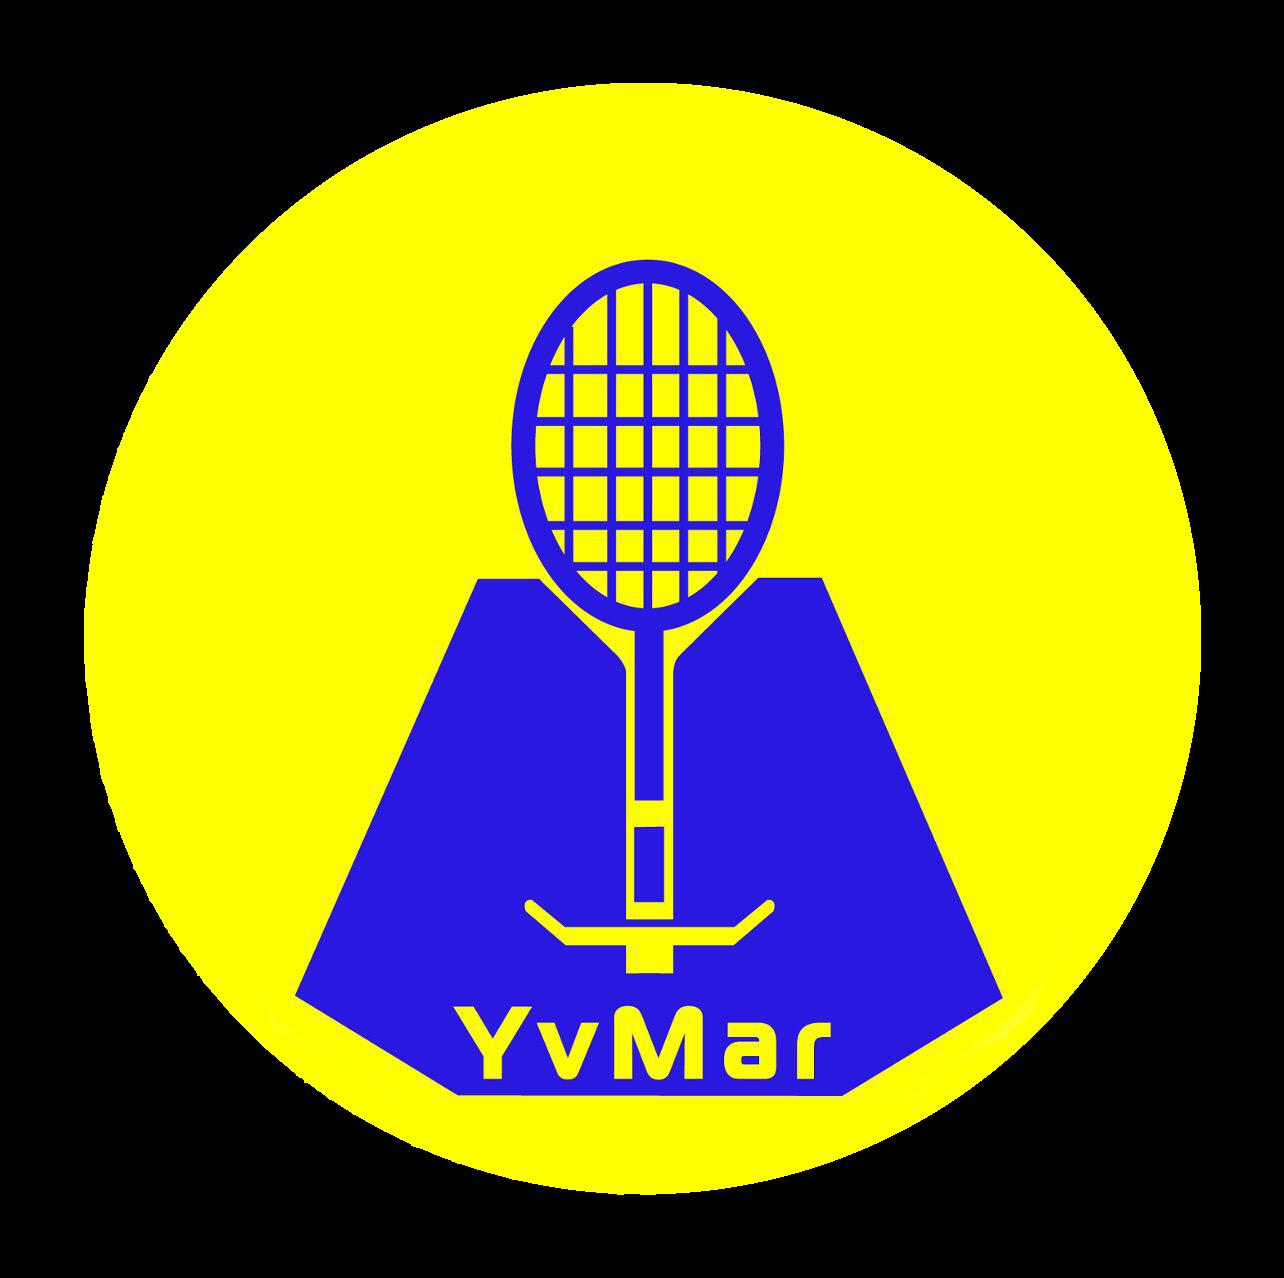 yvmar_logo-round-2.png